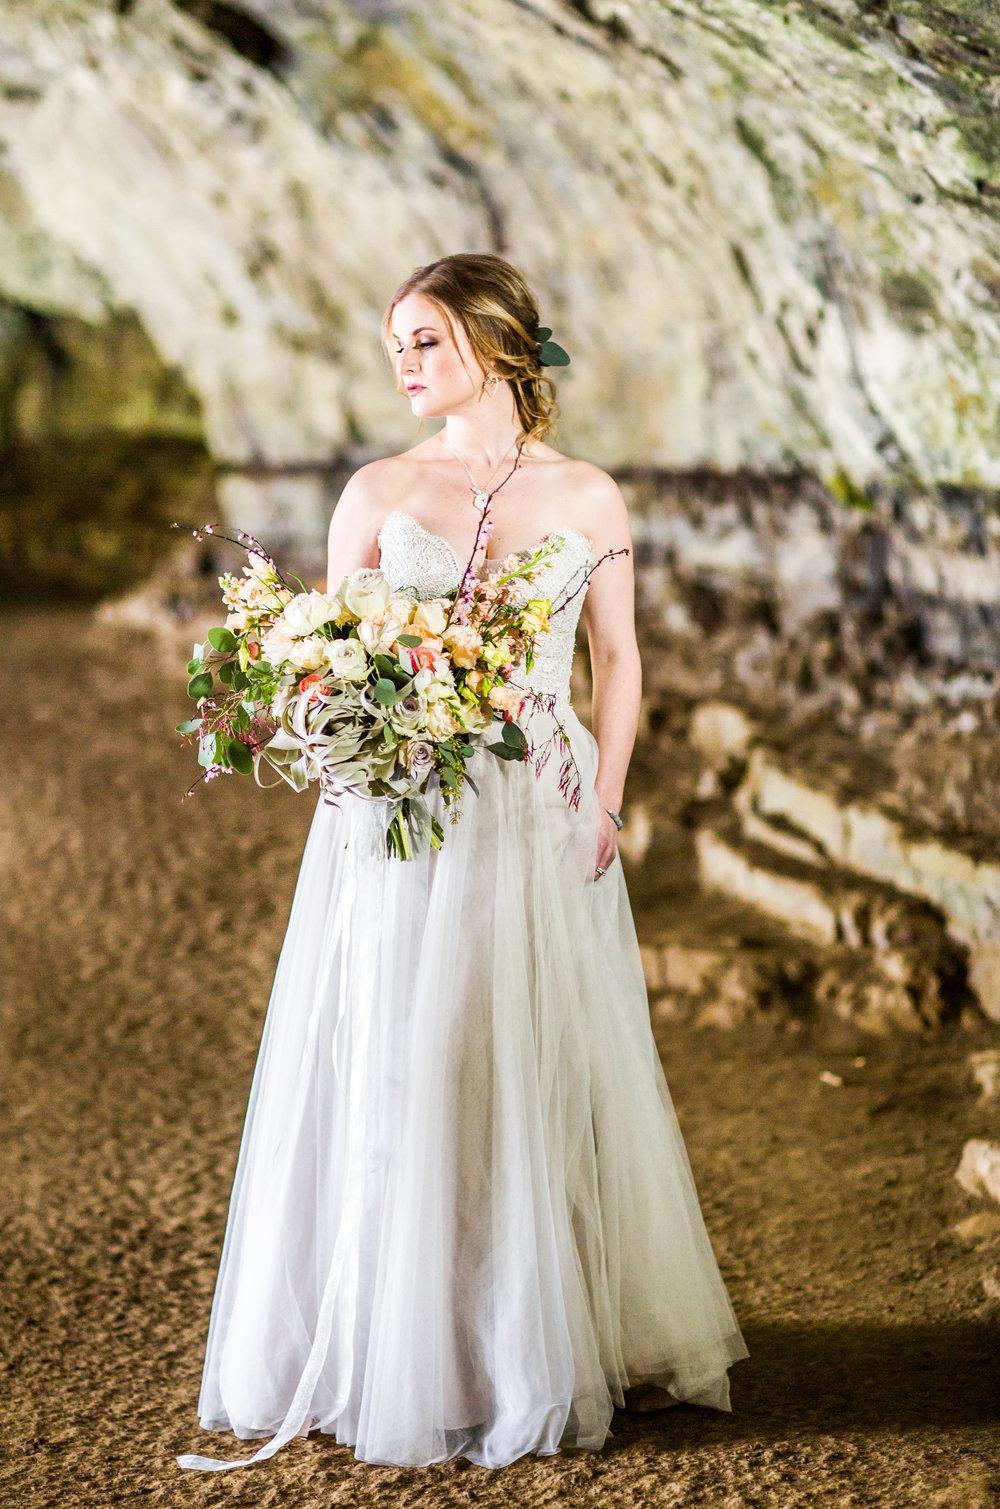 Silver Falls-elopement-bride-and-groom-photo Corina Silva Studios-9.jpg